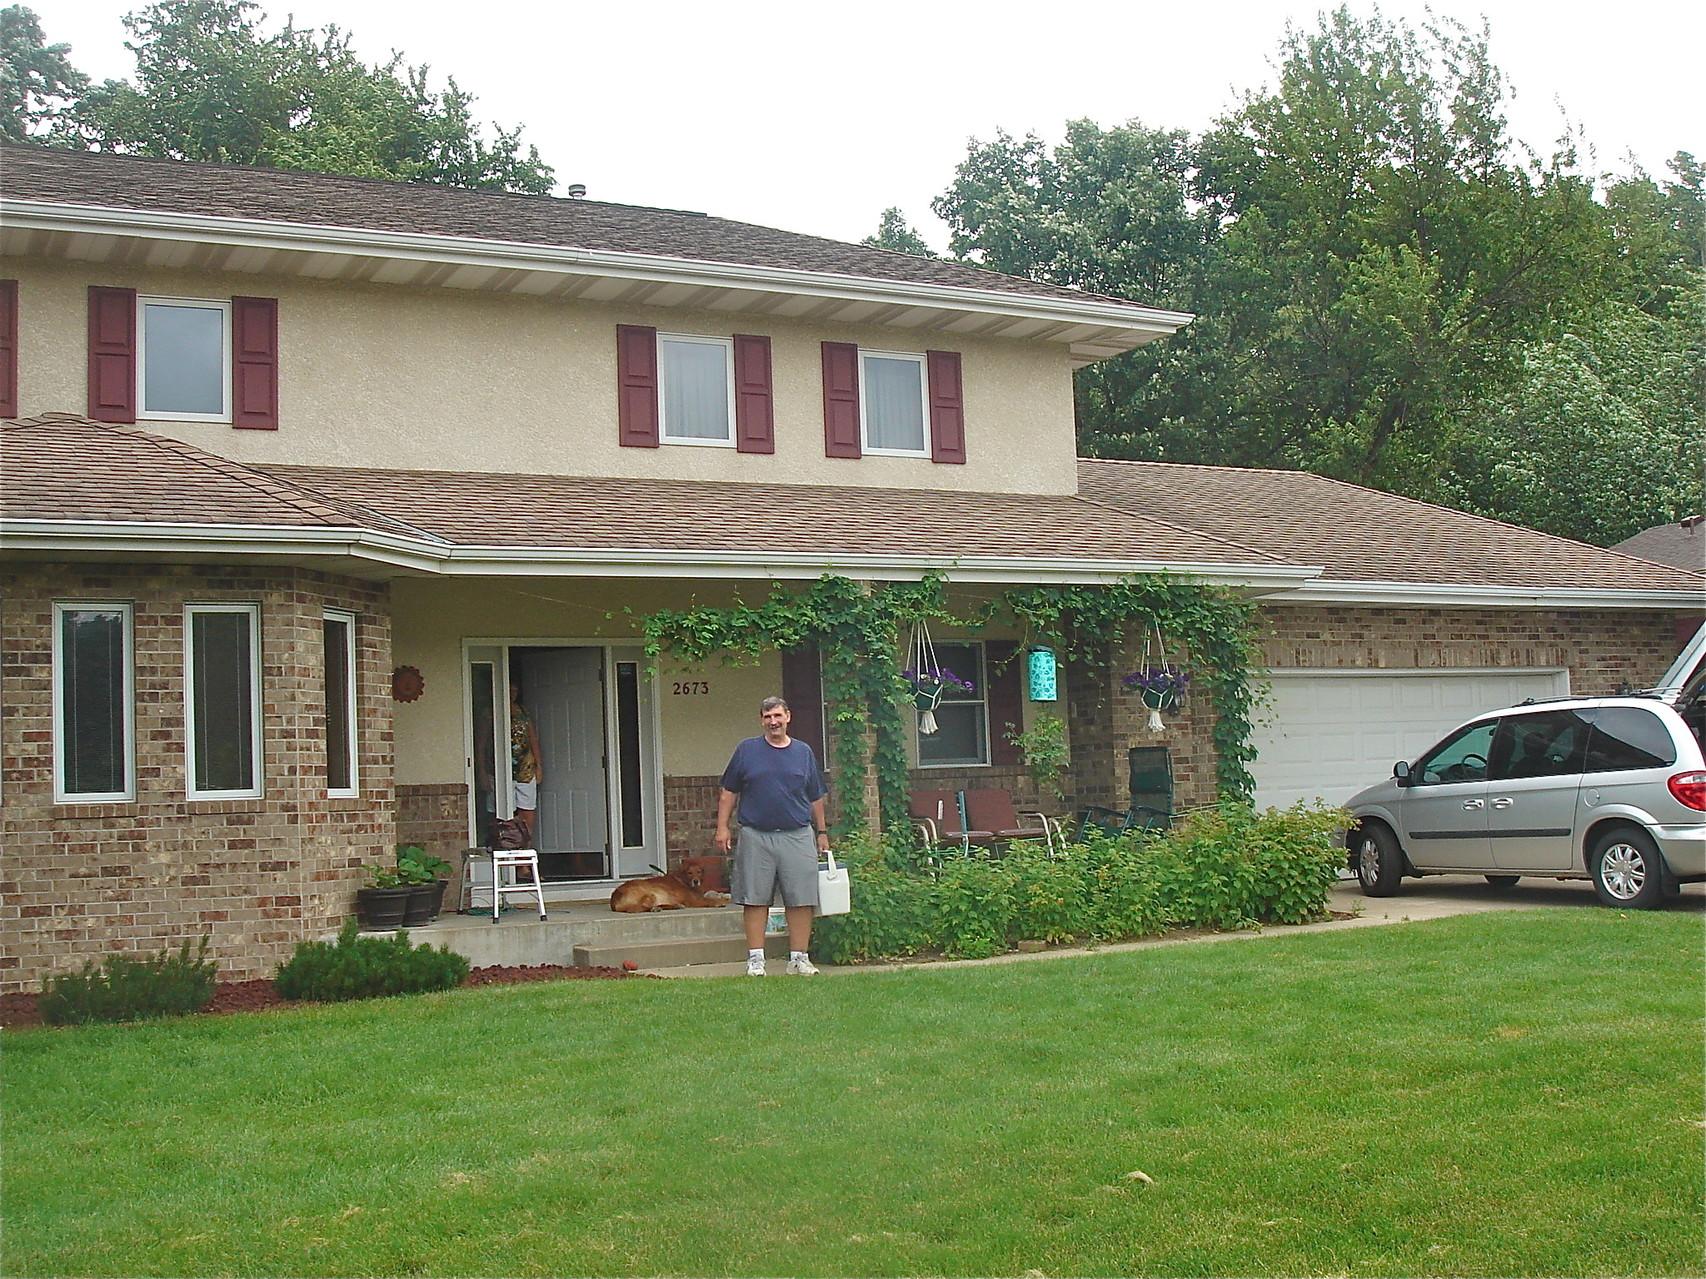 Ann & John Ackerman's home, Arden Ave. Mounds View, Minn., Paul in front